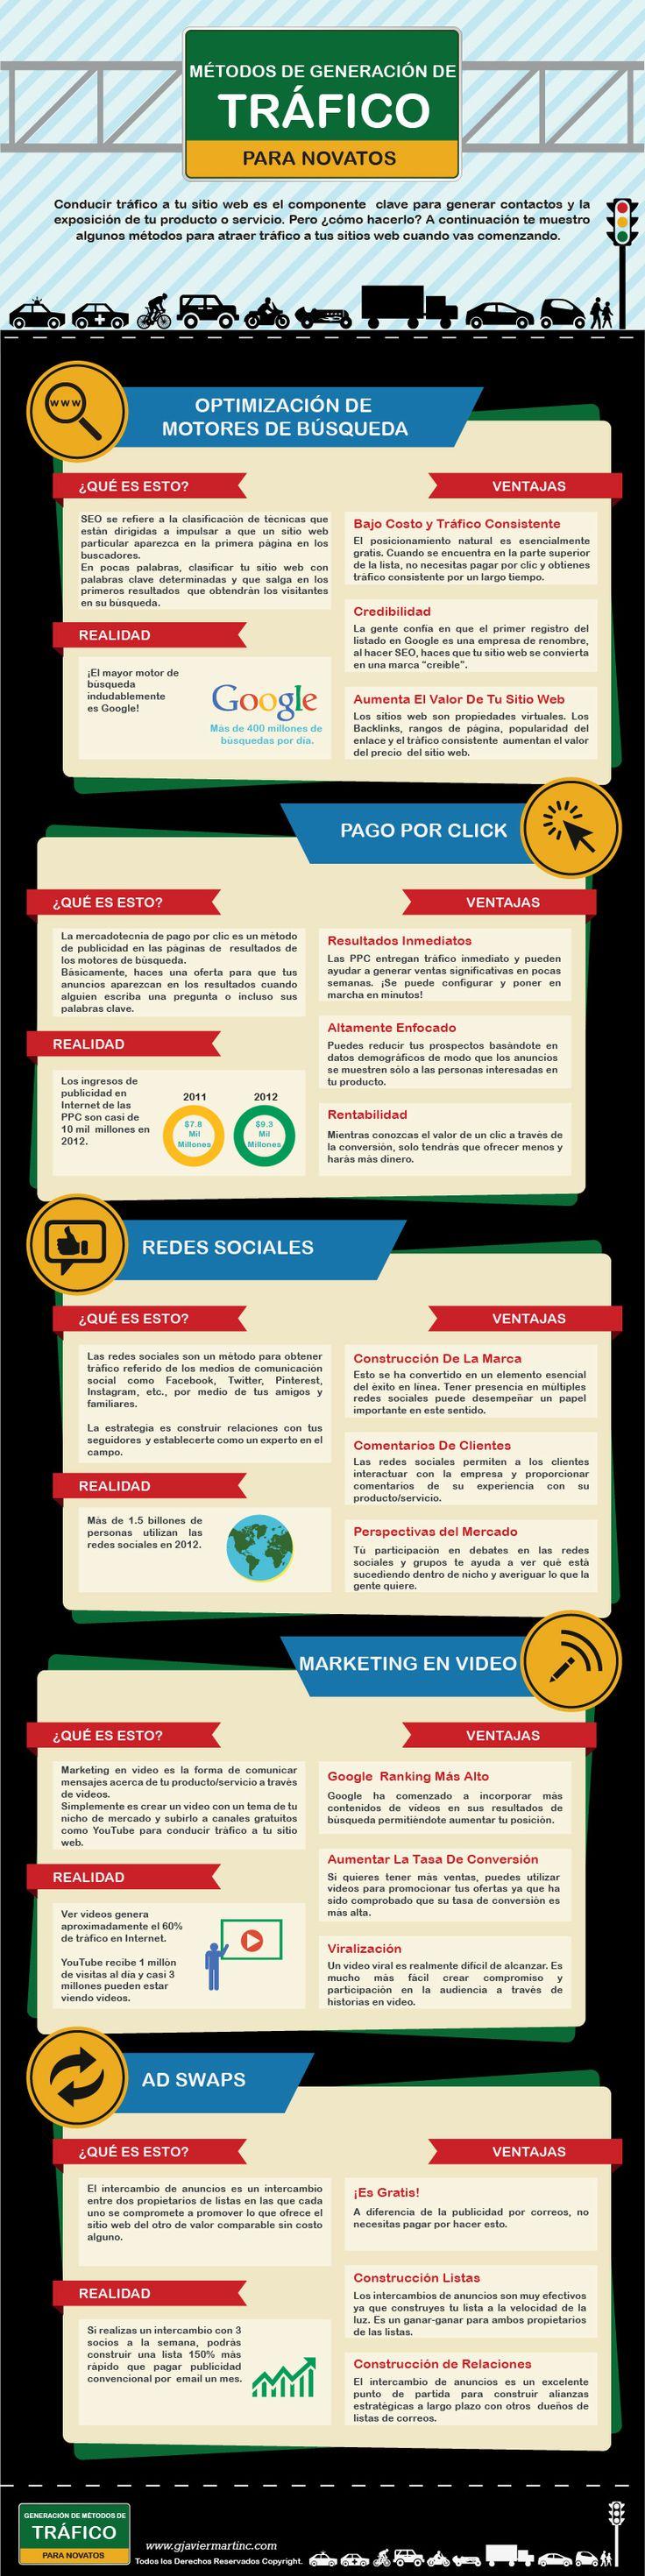 5 Métodos de generación de tráfico para novatos infografia en español. #CommunityManager